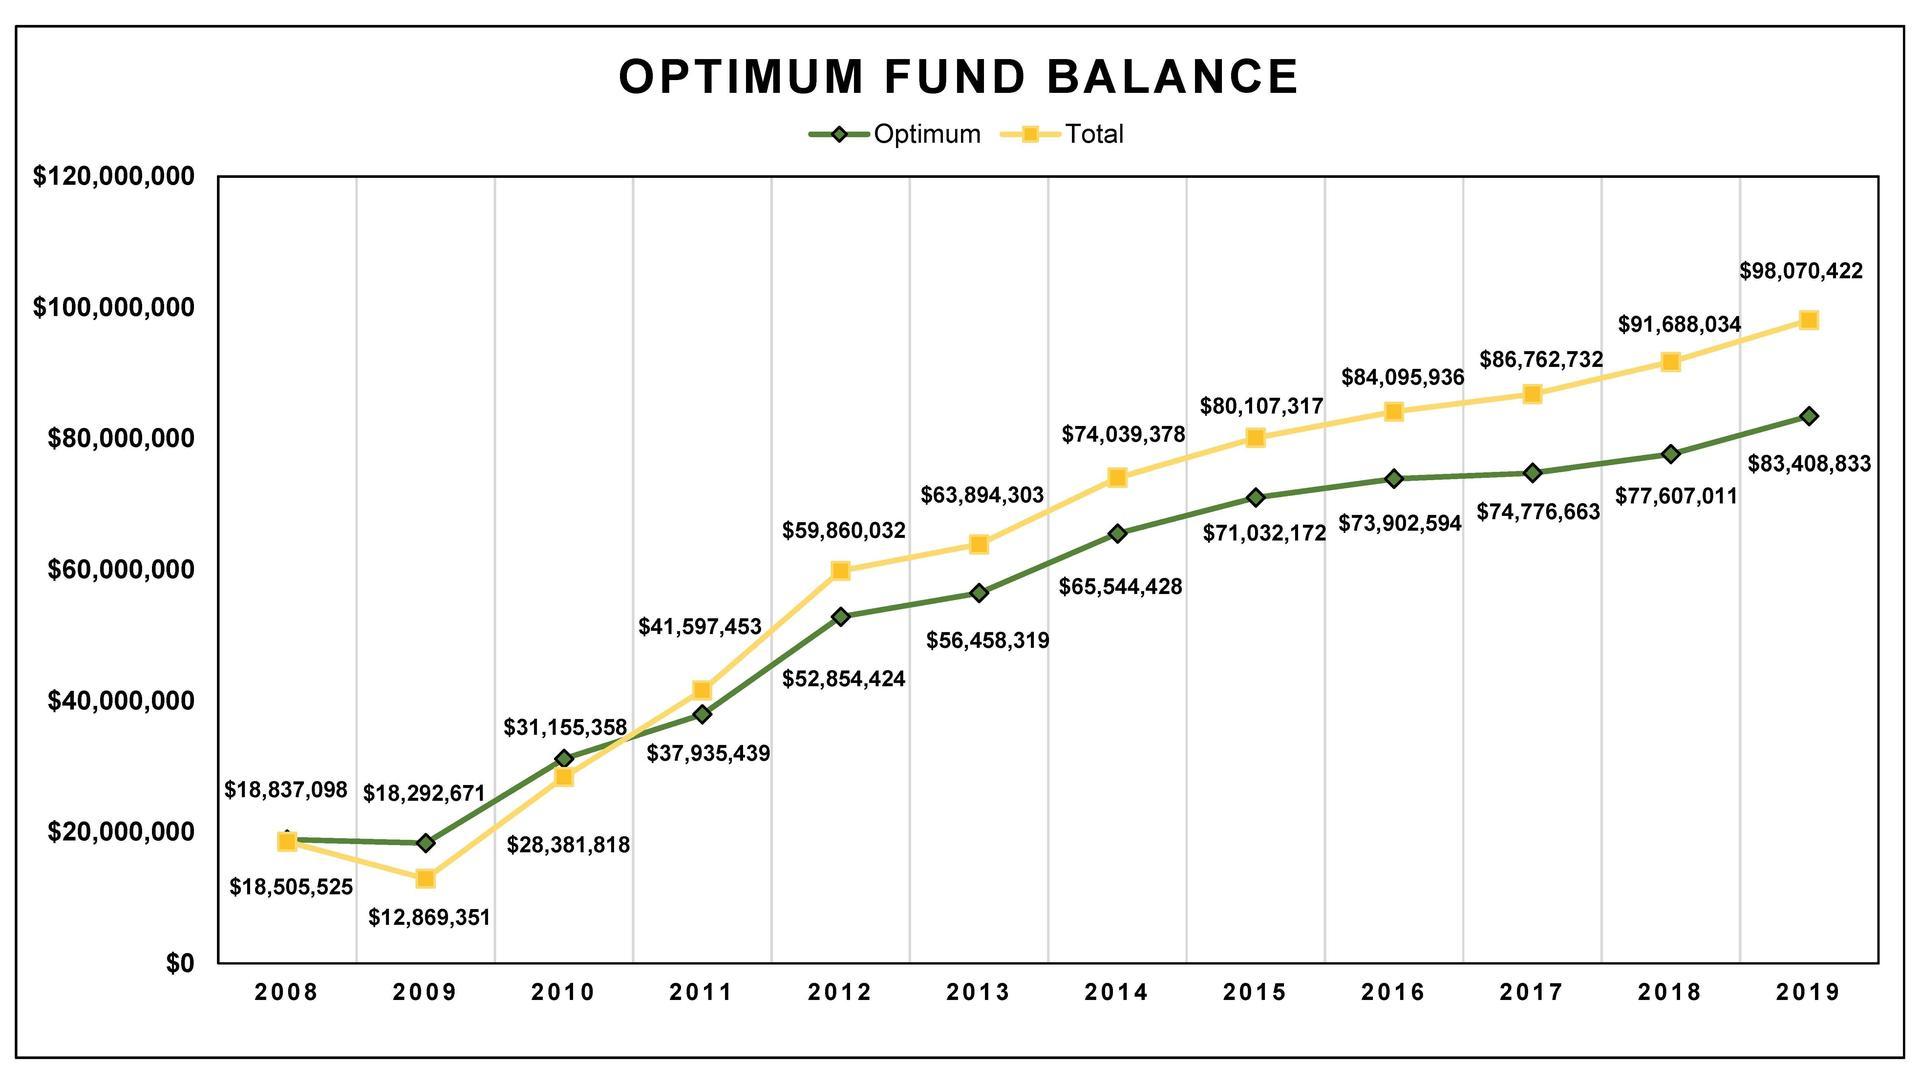 Optimum Fund Balance